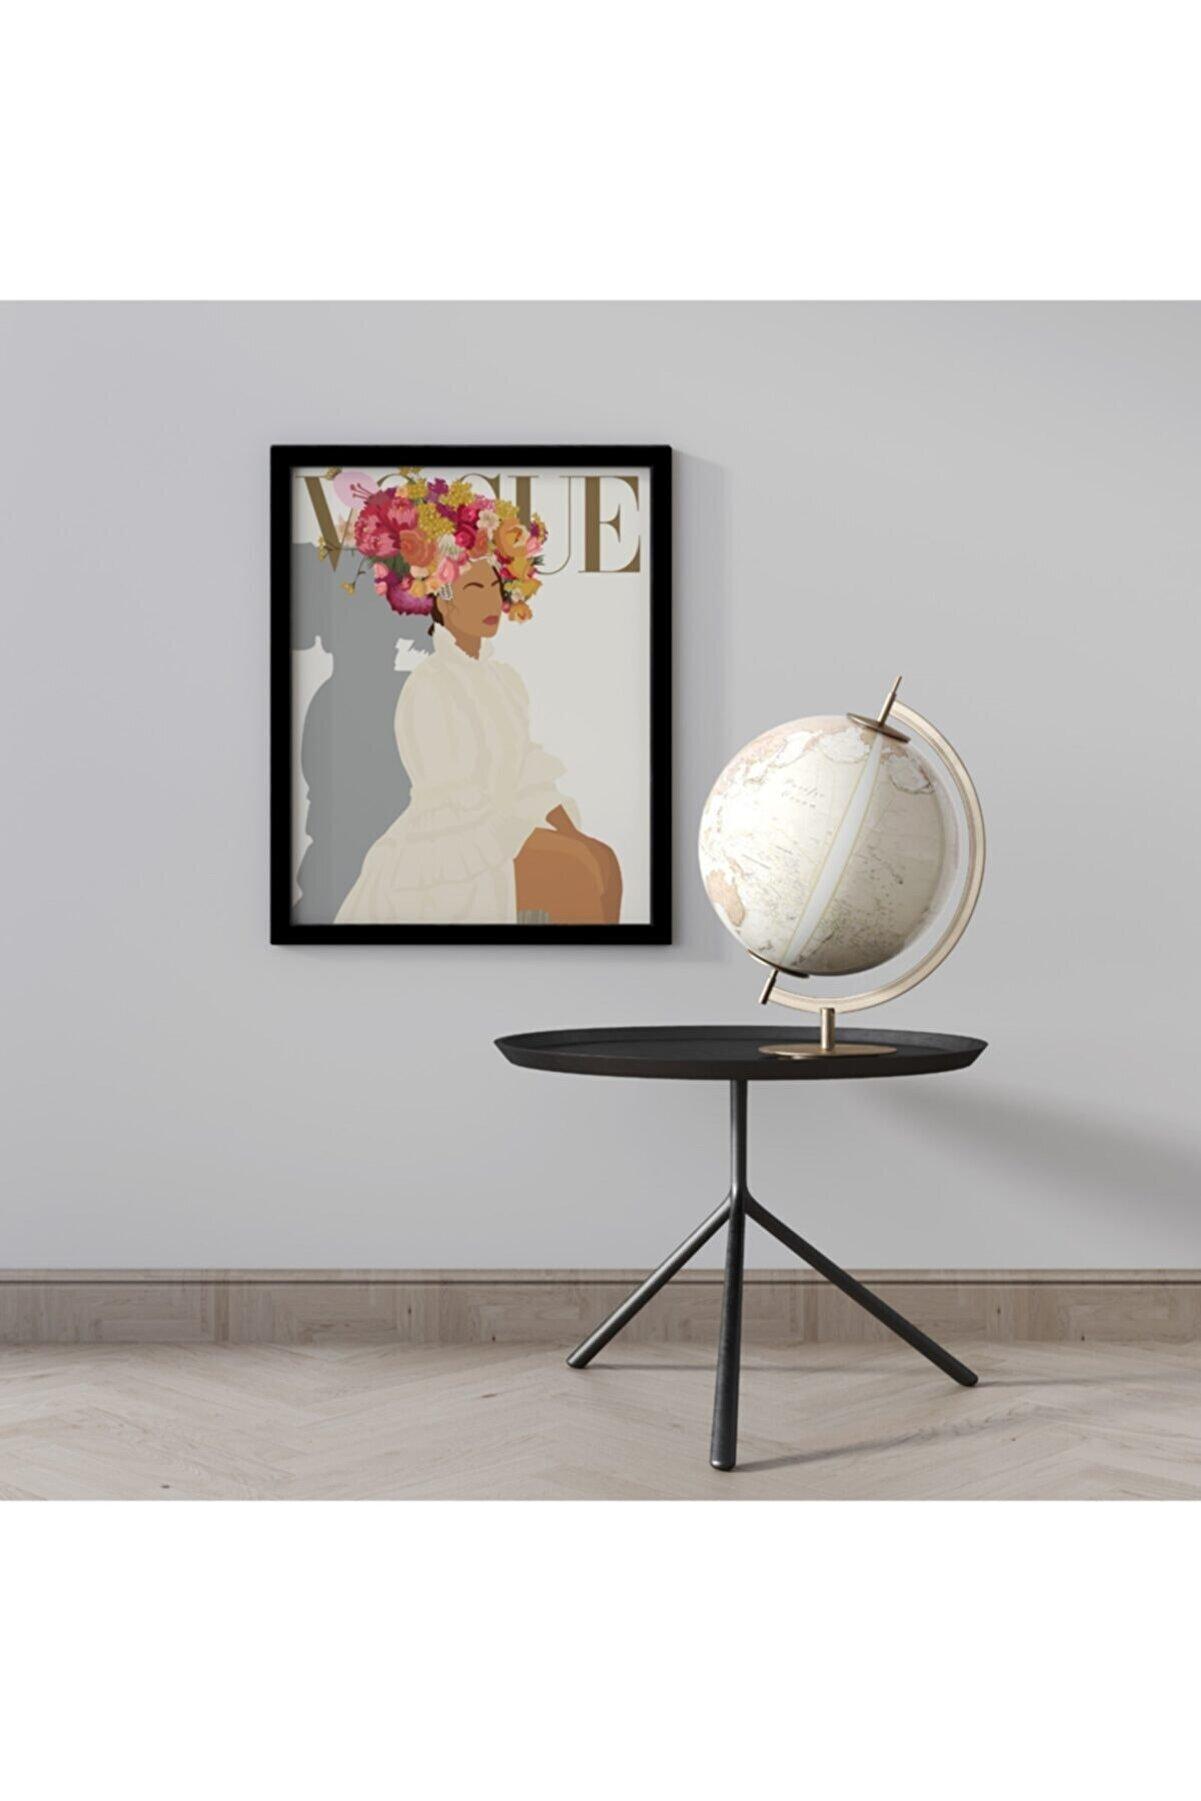 KONSEPT ART Vogue Woman Siyah Ahşap Çerçeveli Sanatsal Exhibition Tablo